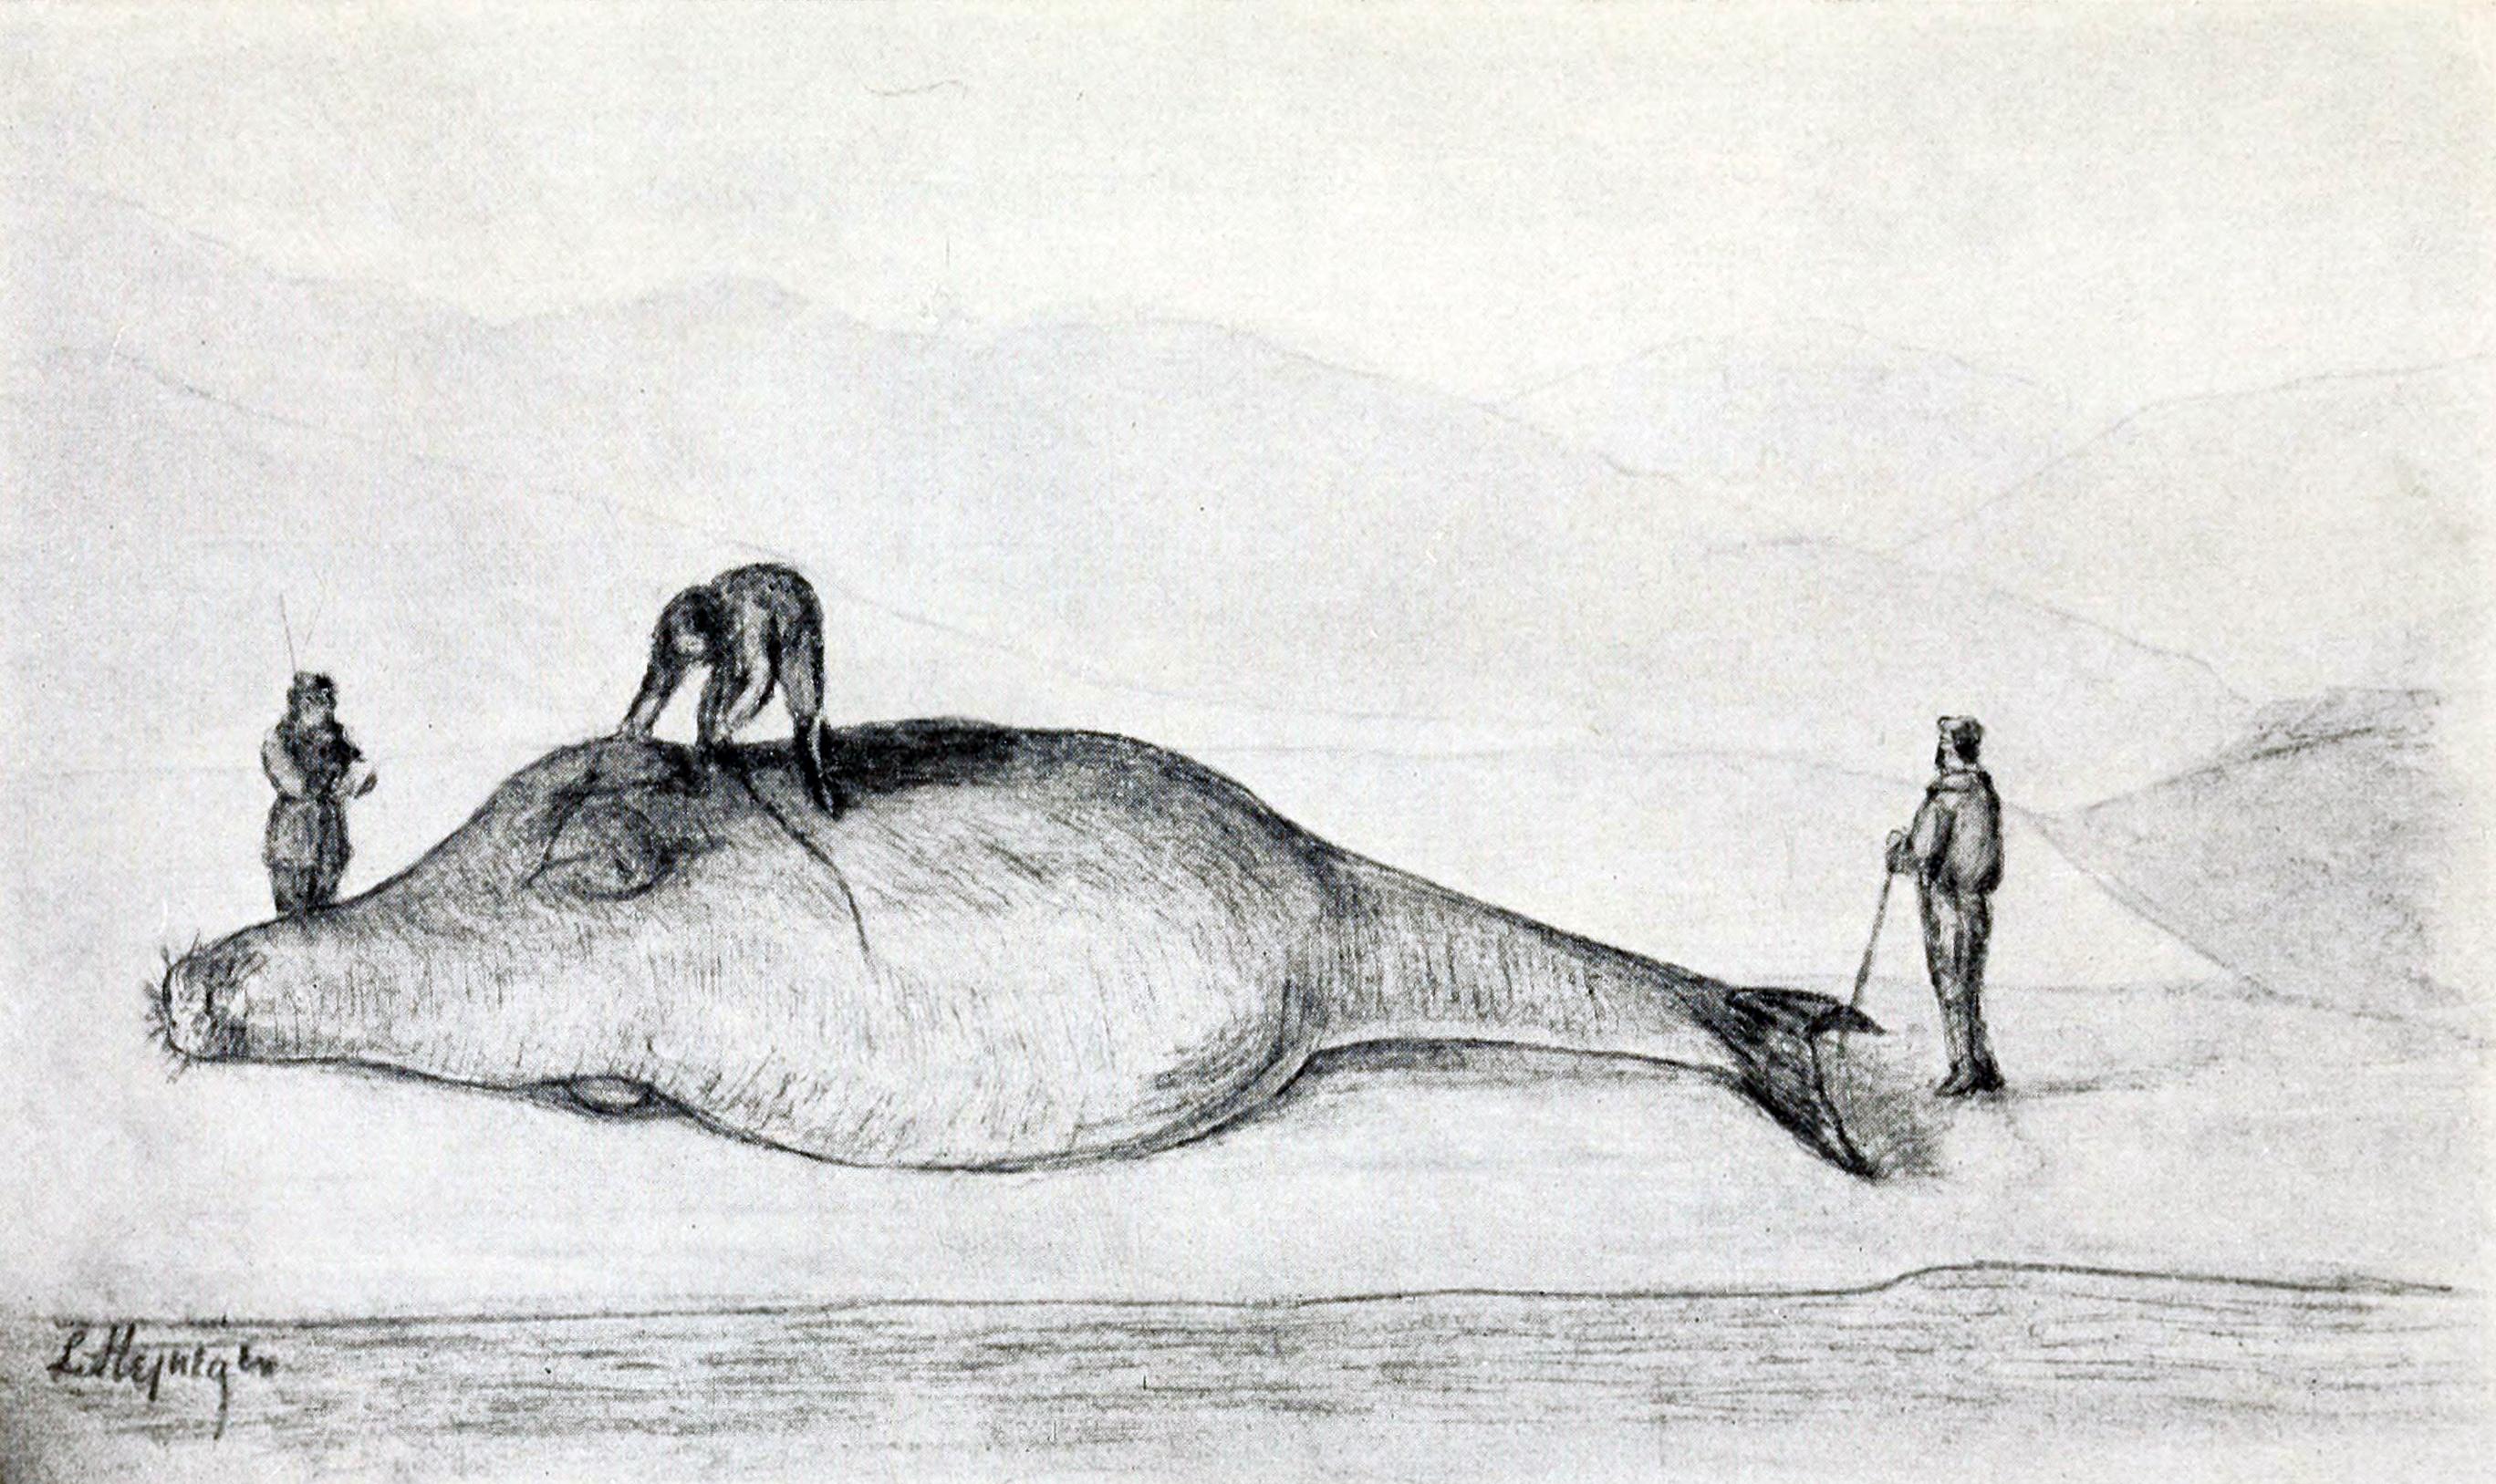 File:Steller measuring a sea cow.jpg